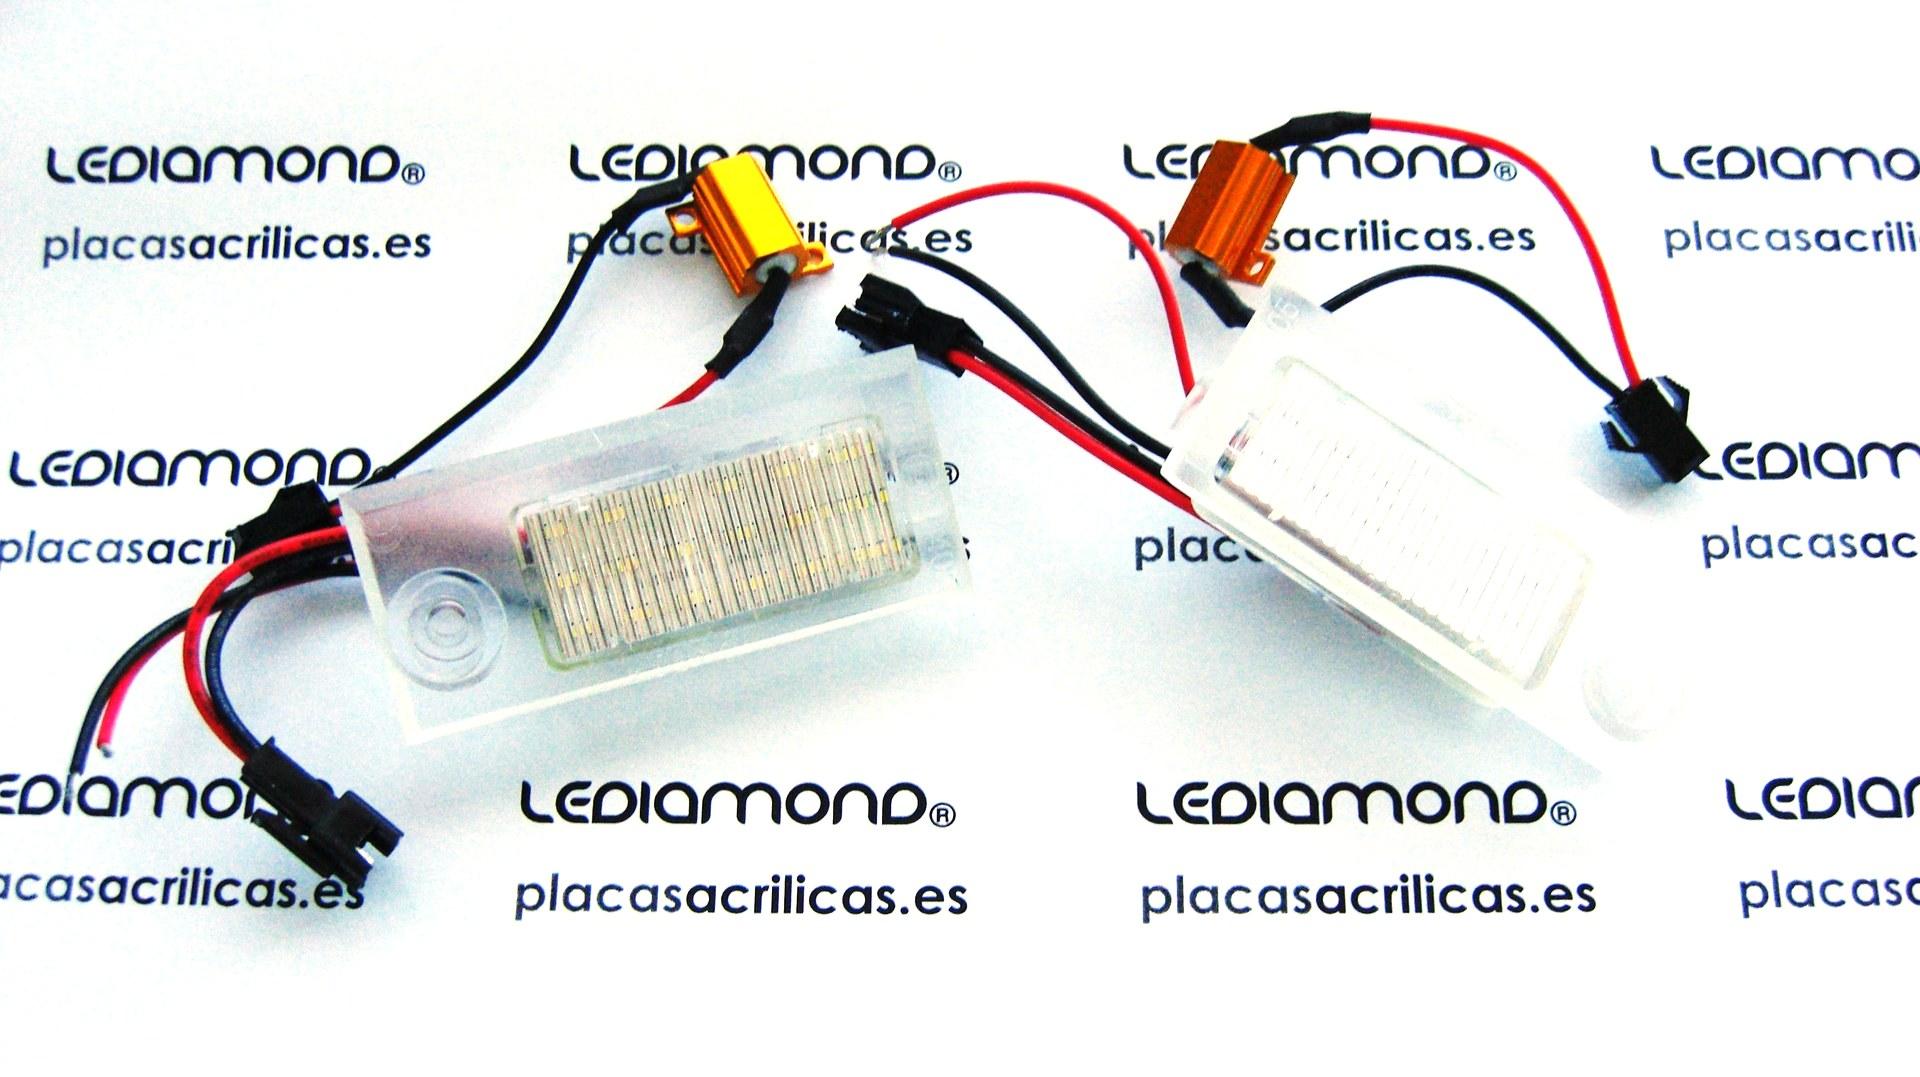 PLAFONES MATRICULA LED AUDI A6 C5 RS6 2003 LEDIAMOND LMD030816 (2)